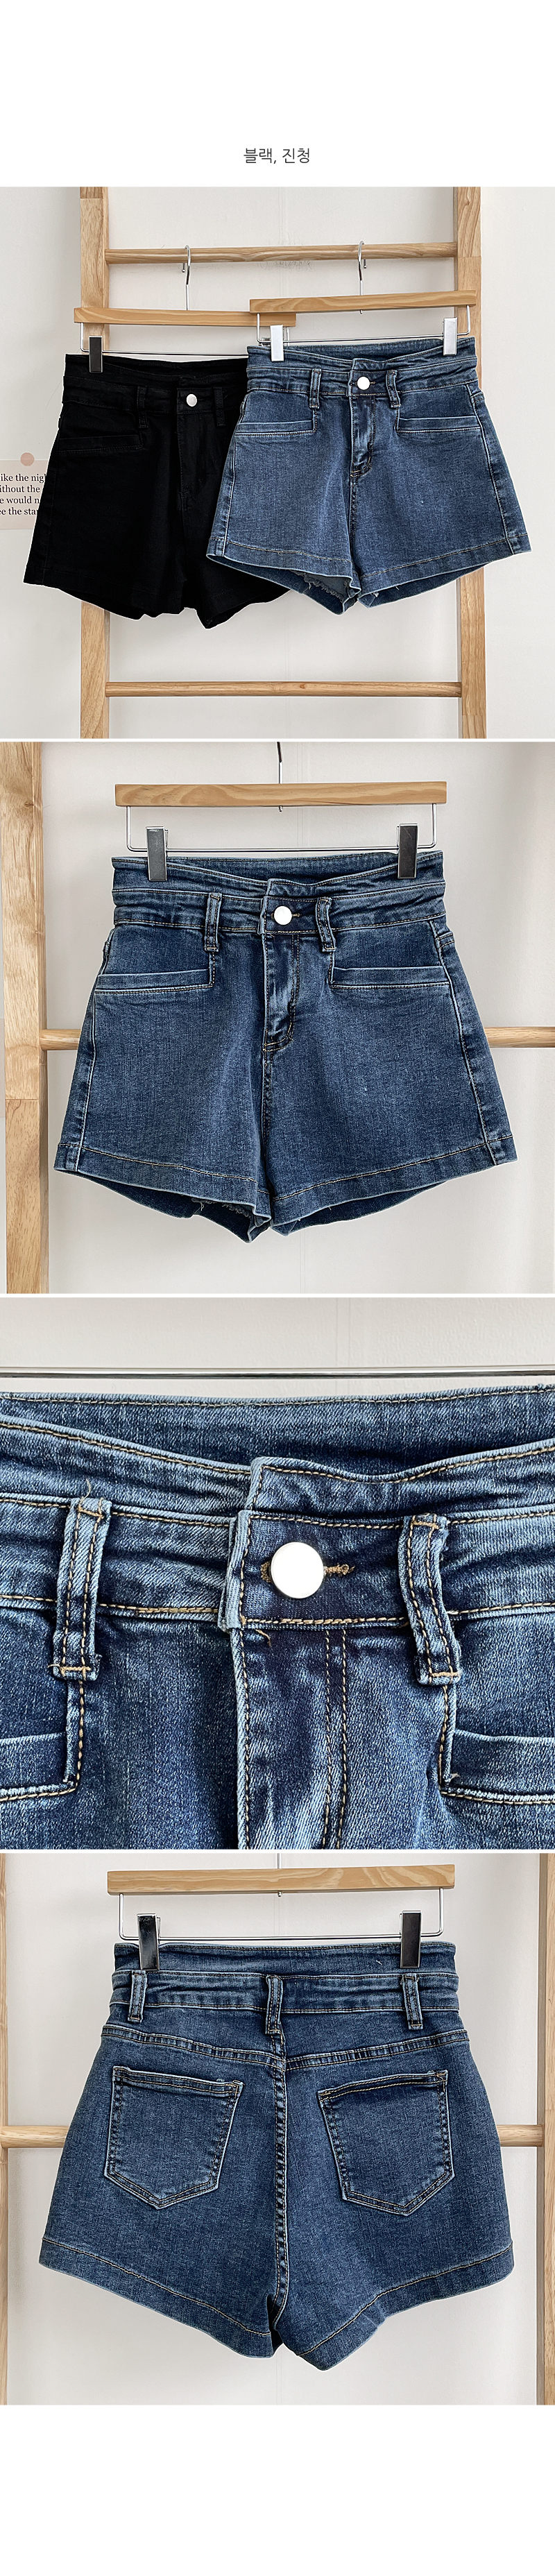 Mono short pants